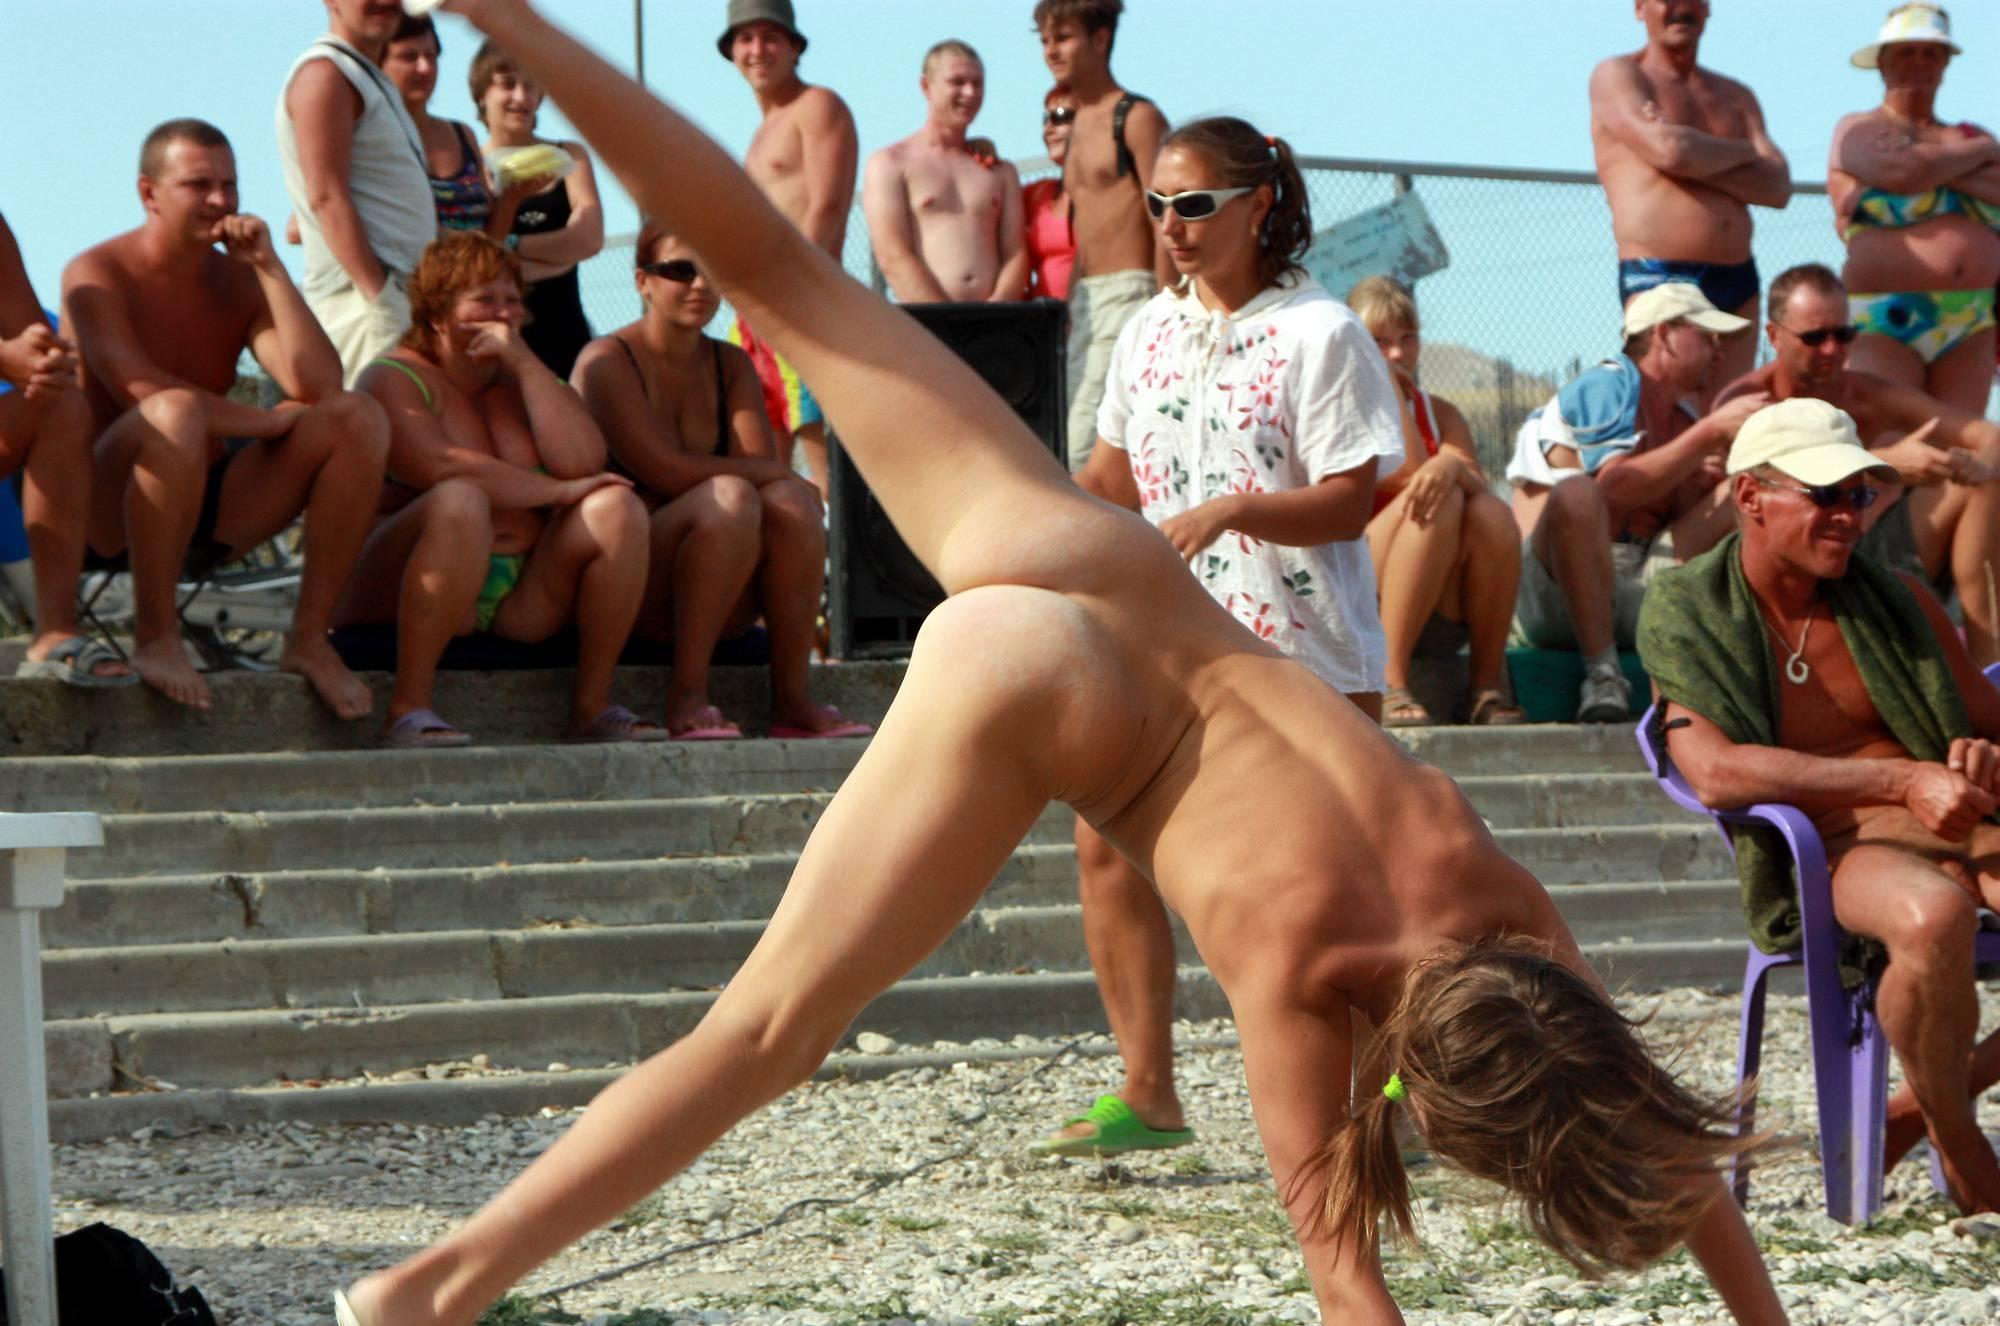 Nudist Photos Cartwheel and Beach Dance - 1